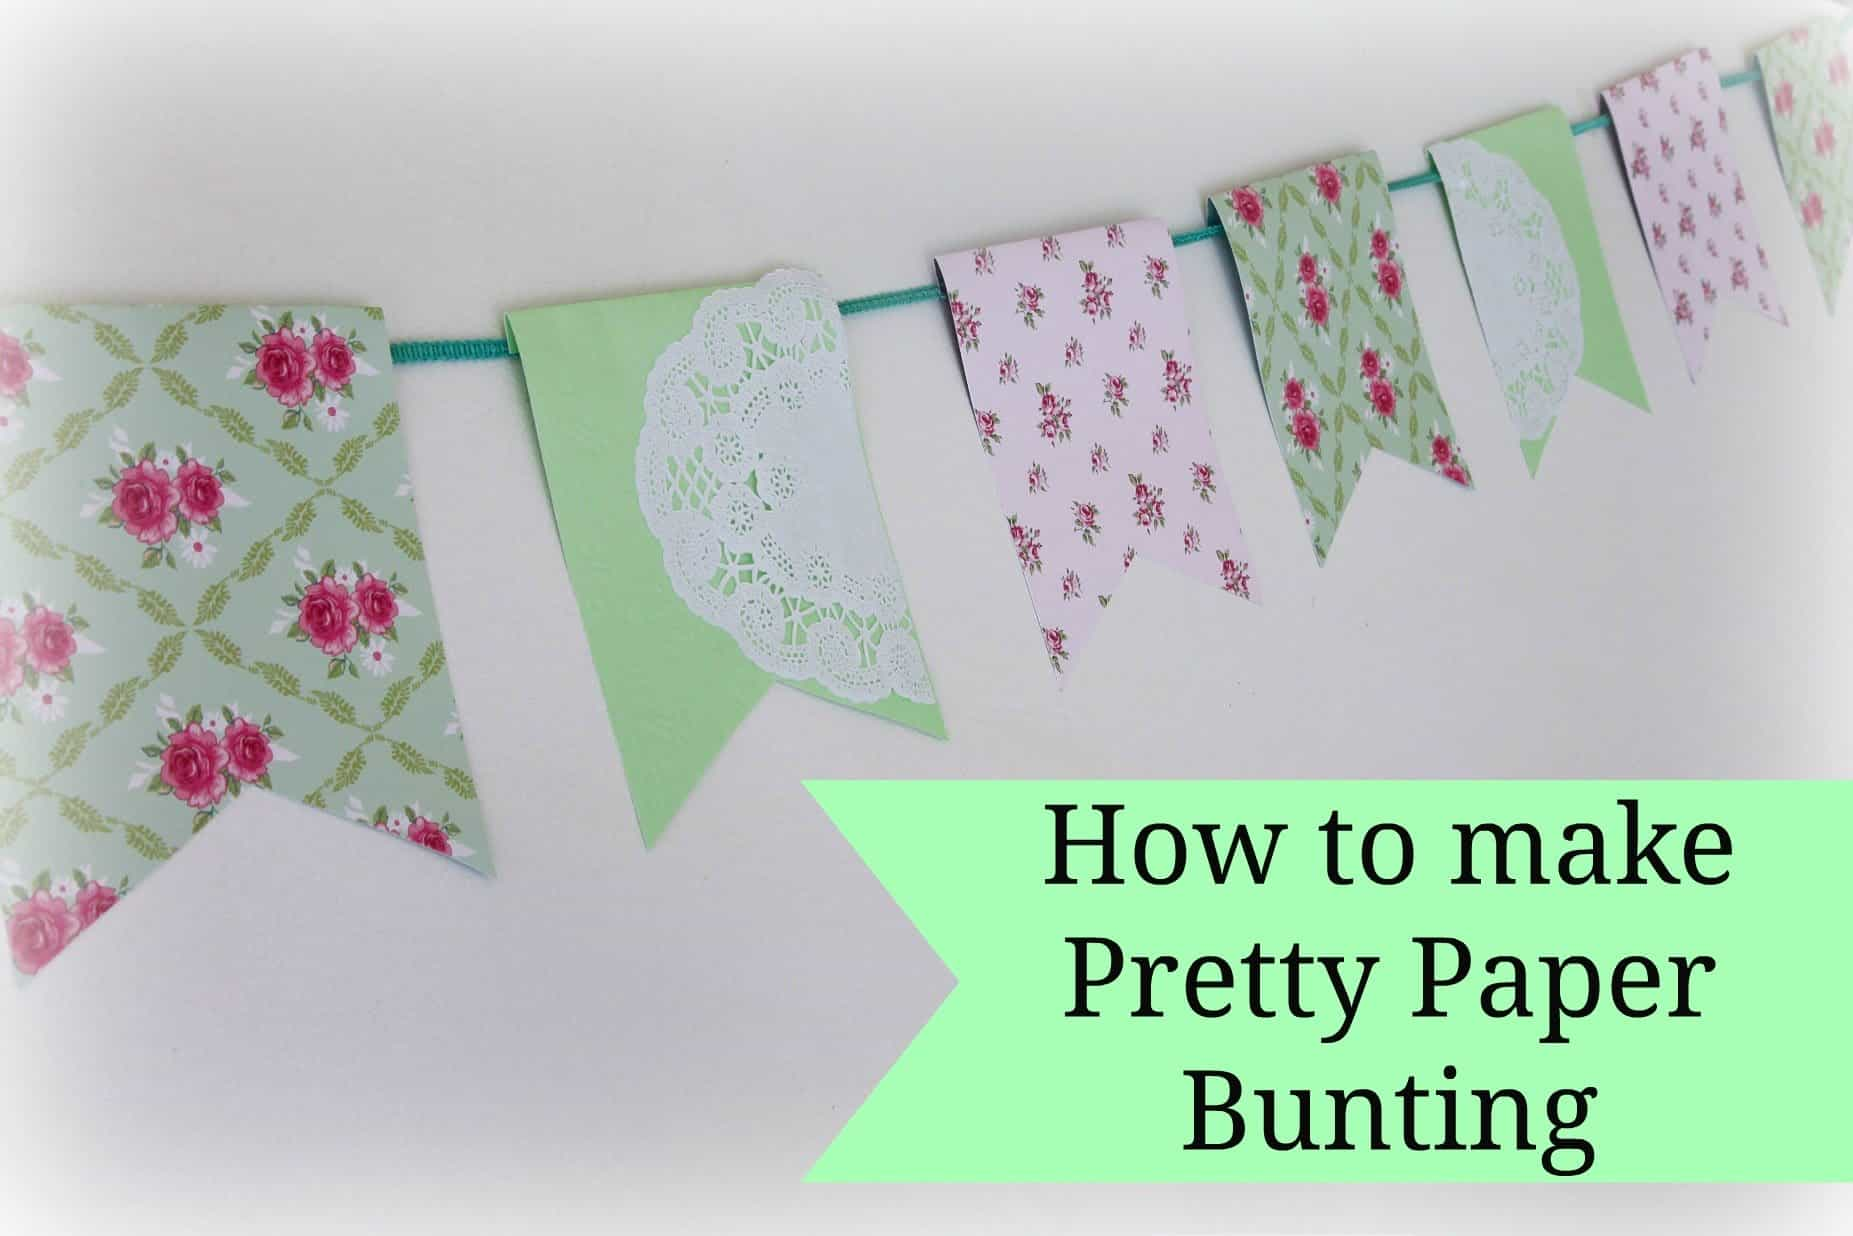 Pretty paper bunting